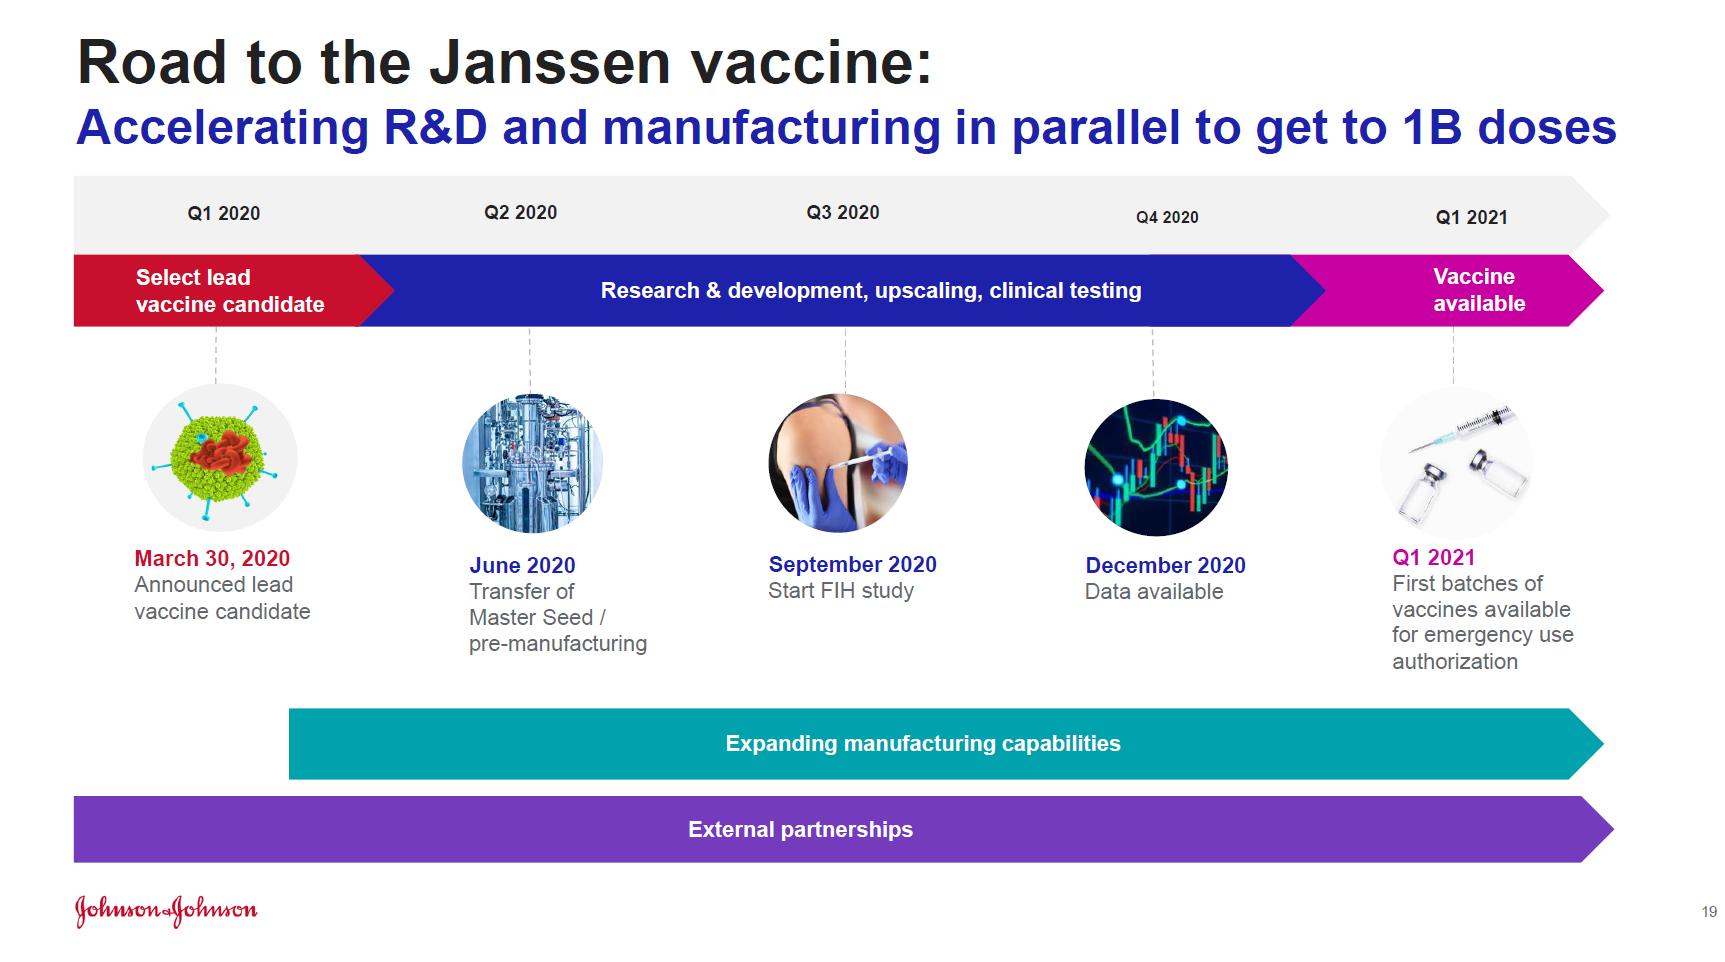 Časový harmonogram vývoje vakcíny Johnson & Johnson proti koronaviru